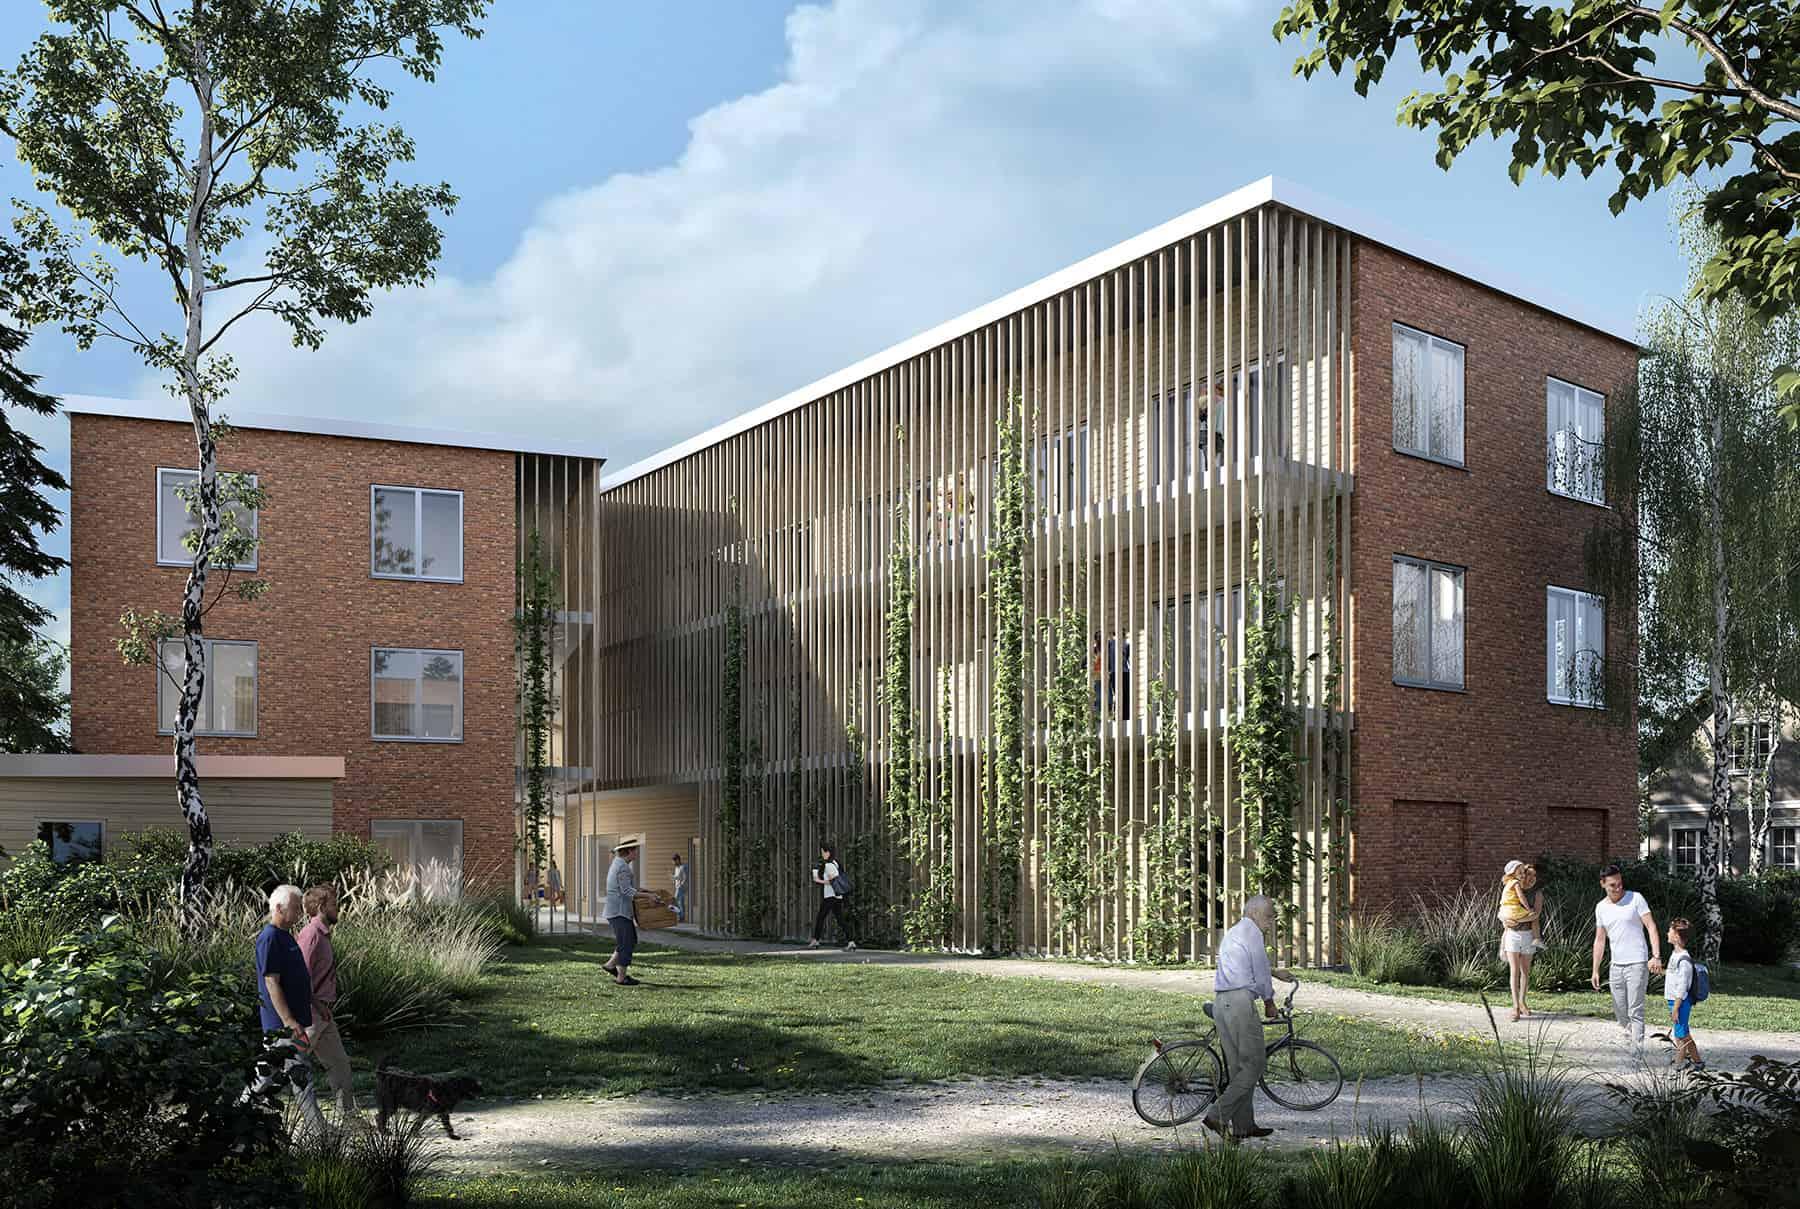 Finland • Apartments • Brick and wood Facade